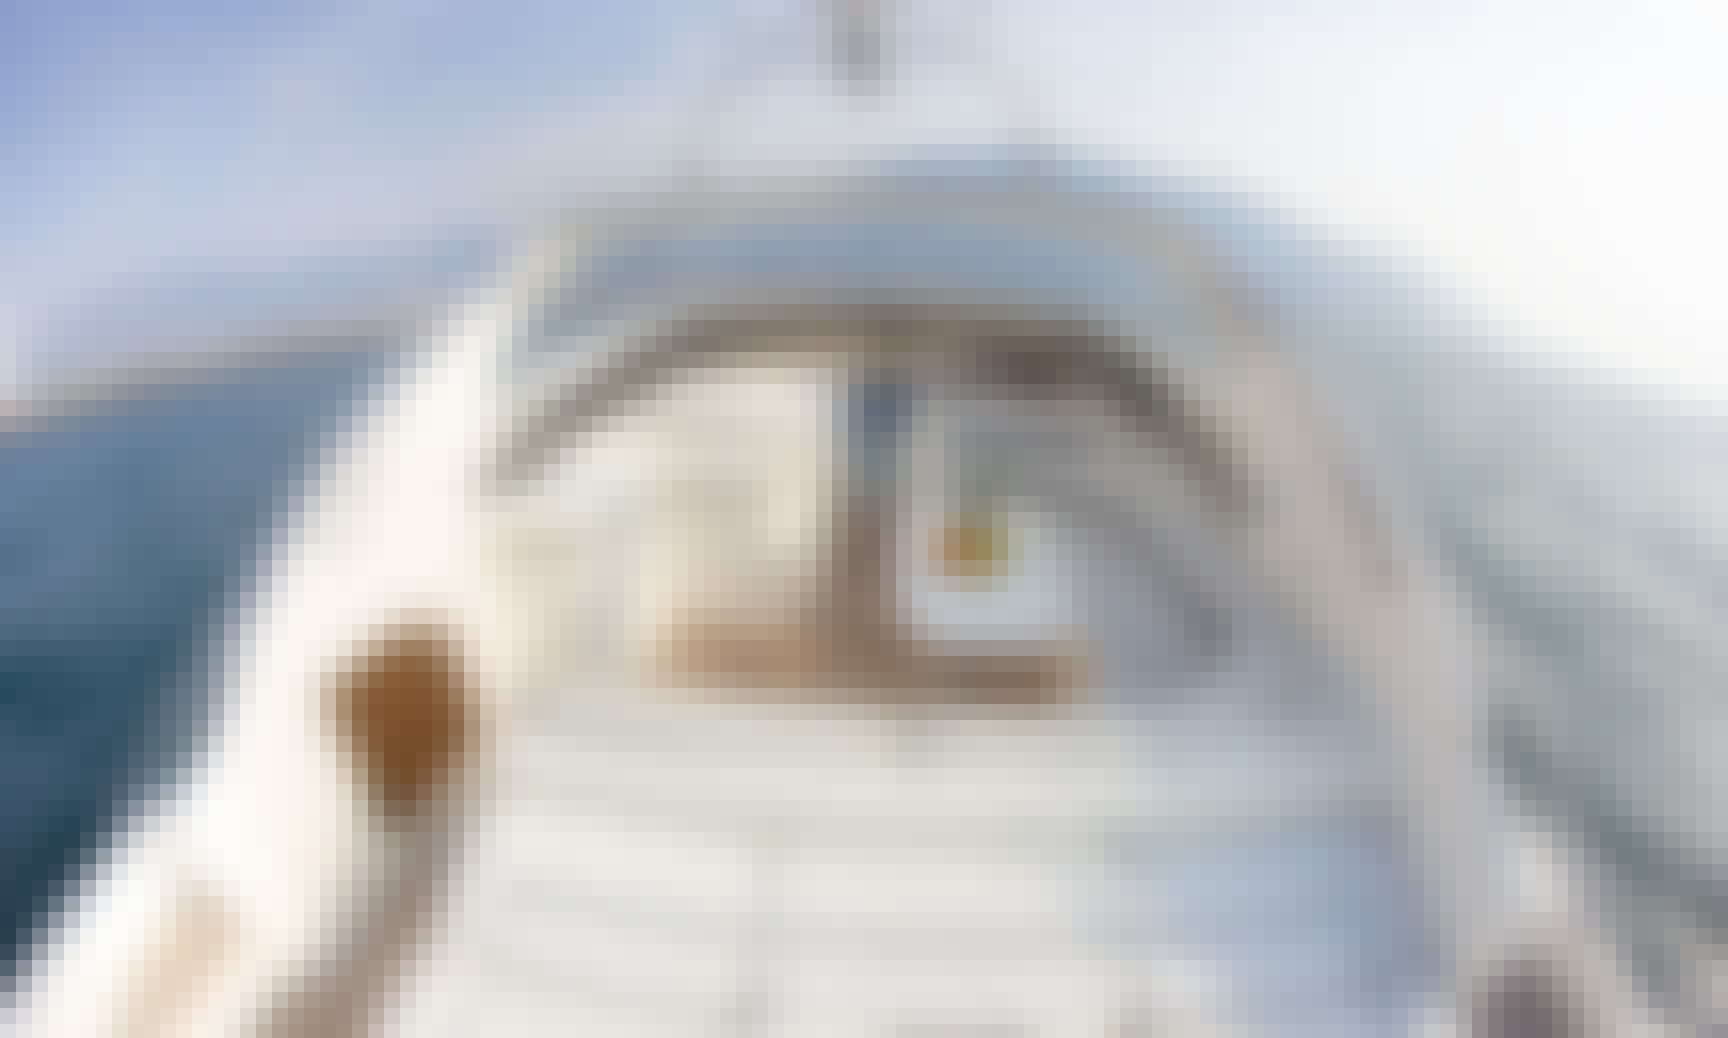 Yacht Charter Princess V50 for 12 People in Sorrento, Capri and Amalfi Coast